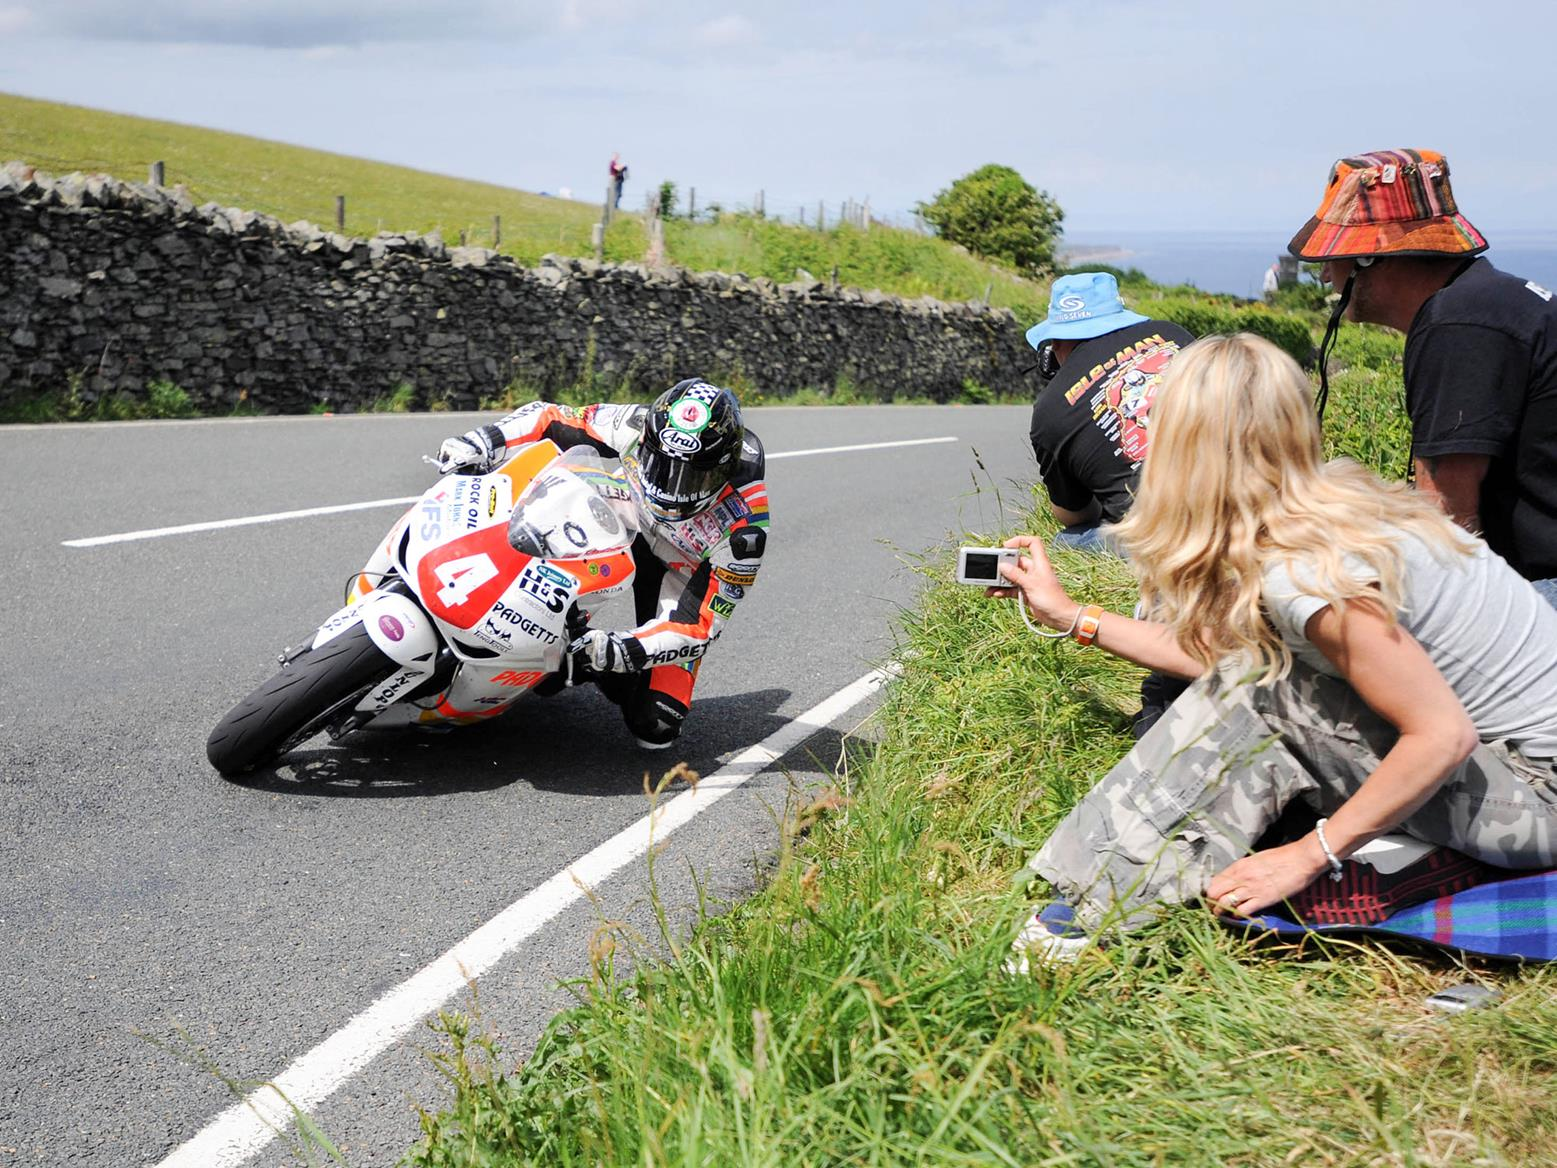 2010 Hutchy Superstock TT win